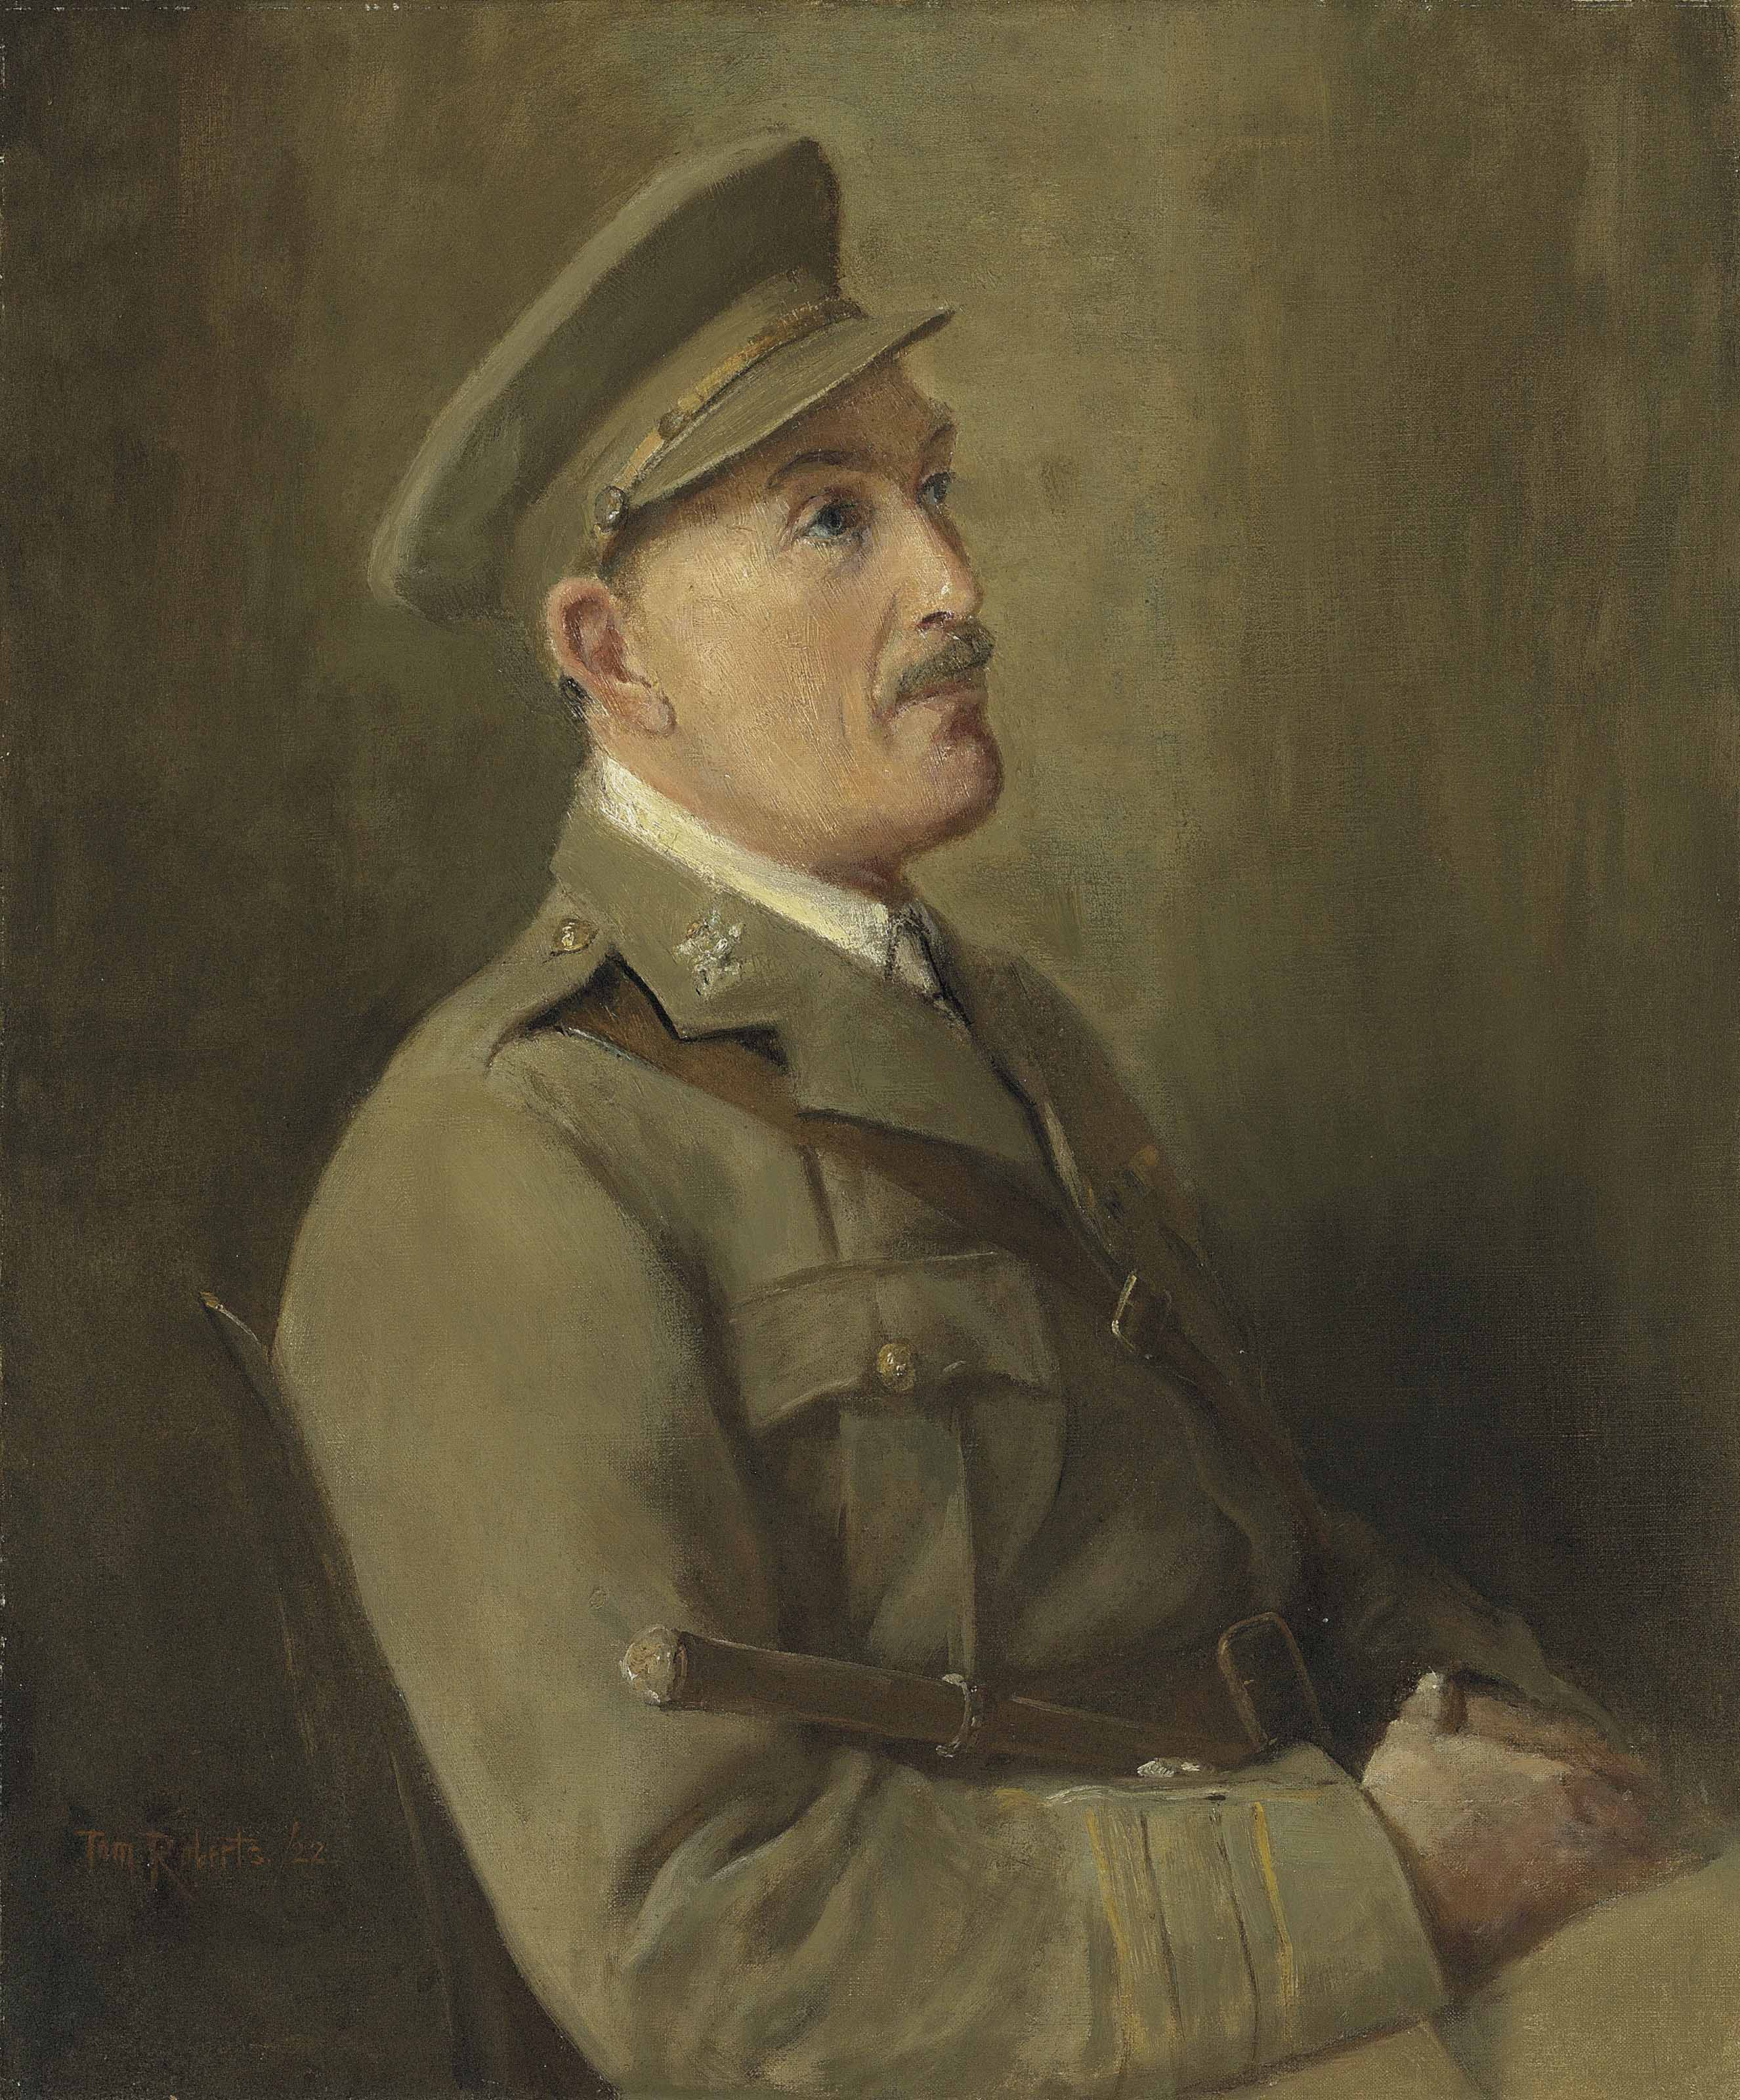 Major Peter Henson Bancroft